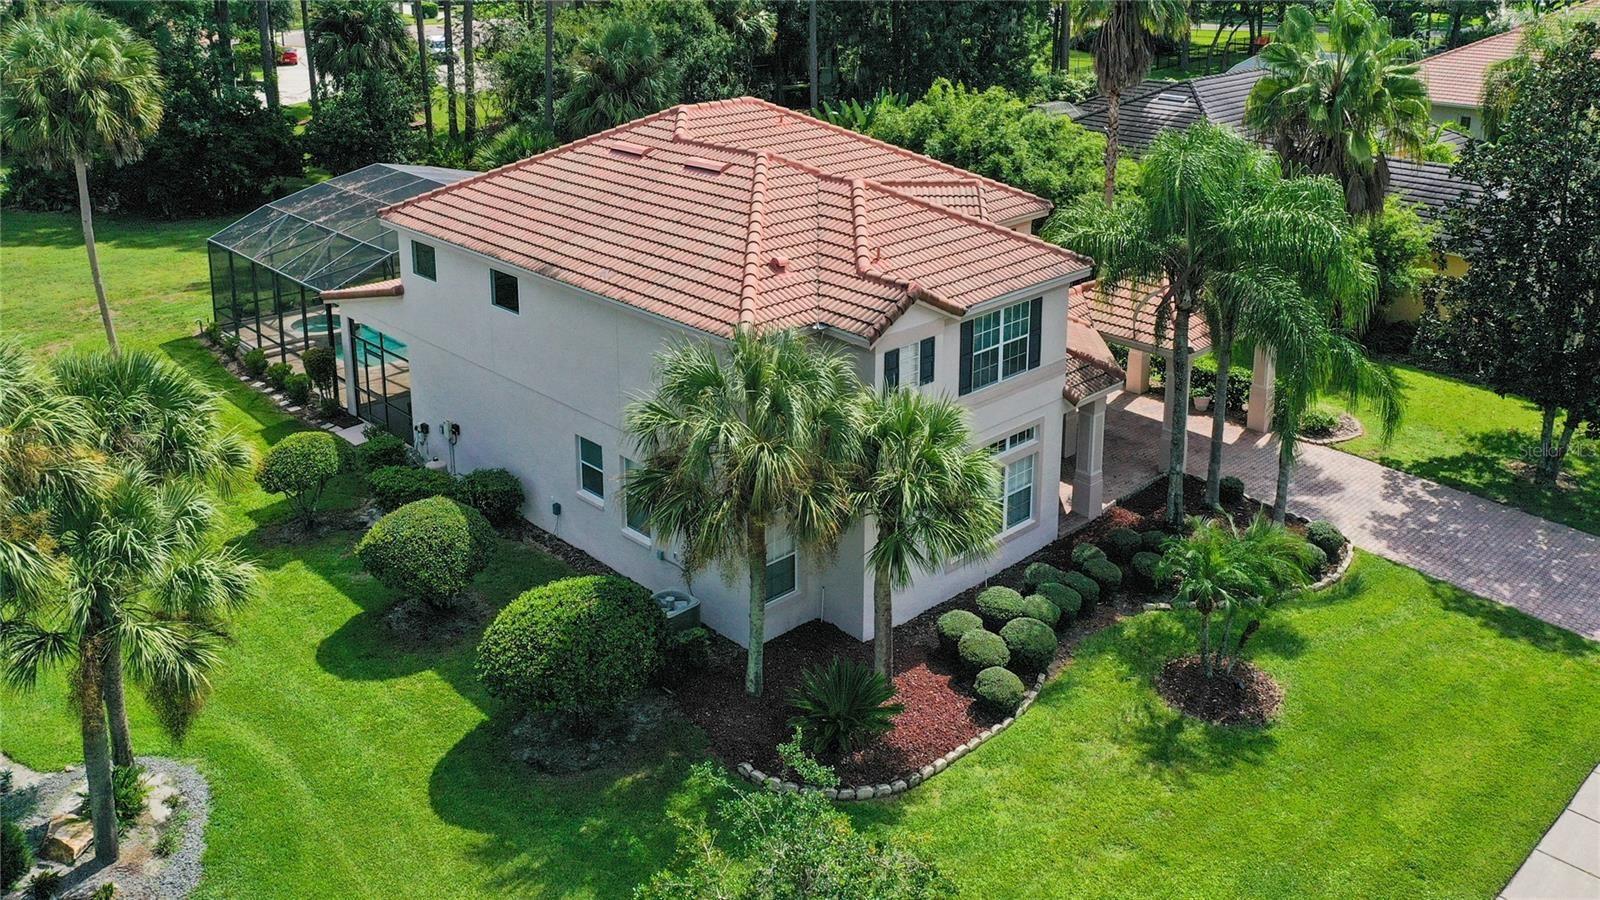 1723 REDWOOD GROVE TERRACE, Lake Mary, FL 32746 - #: O5975525